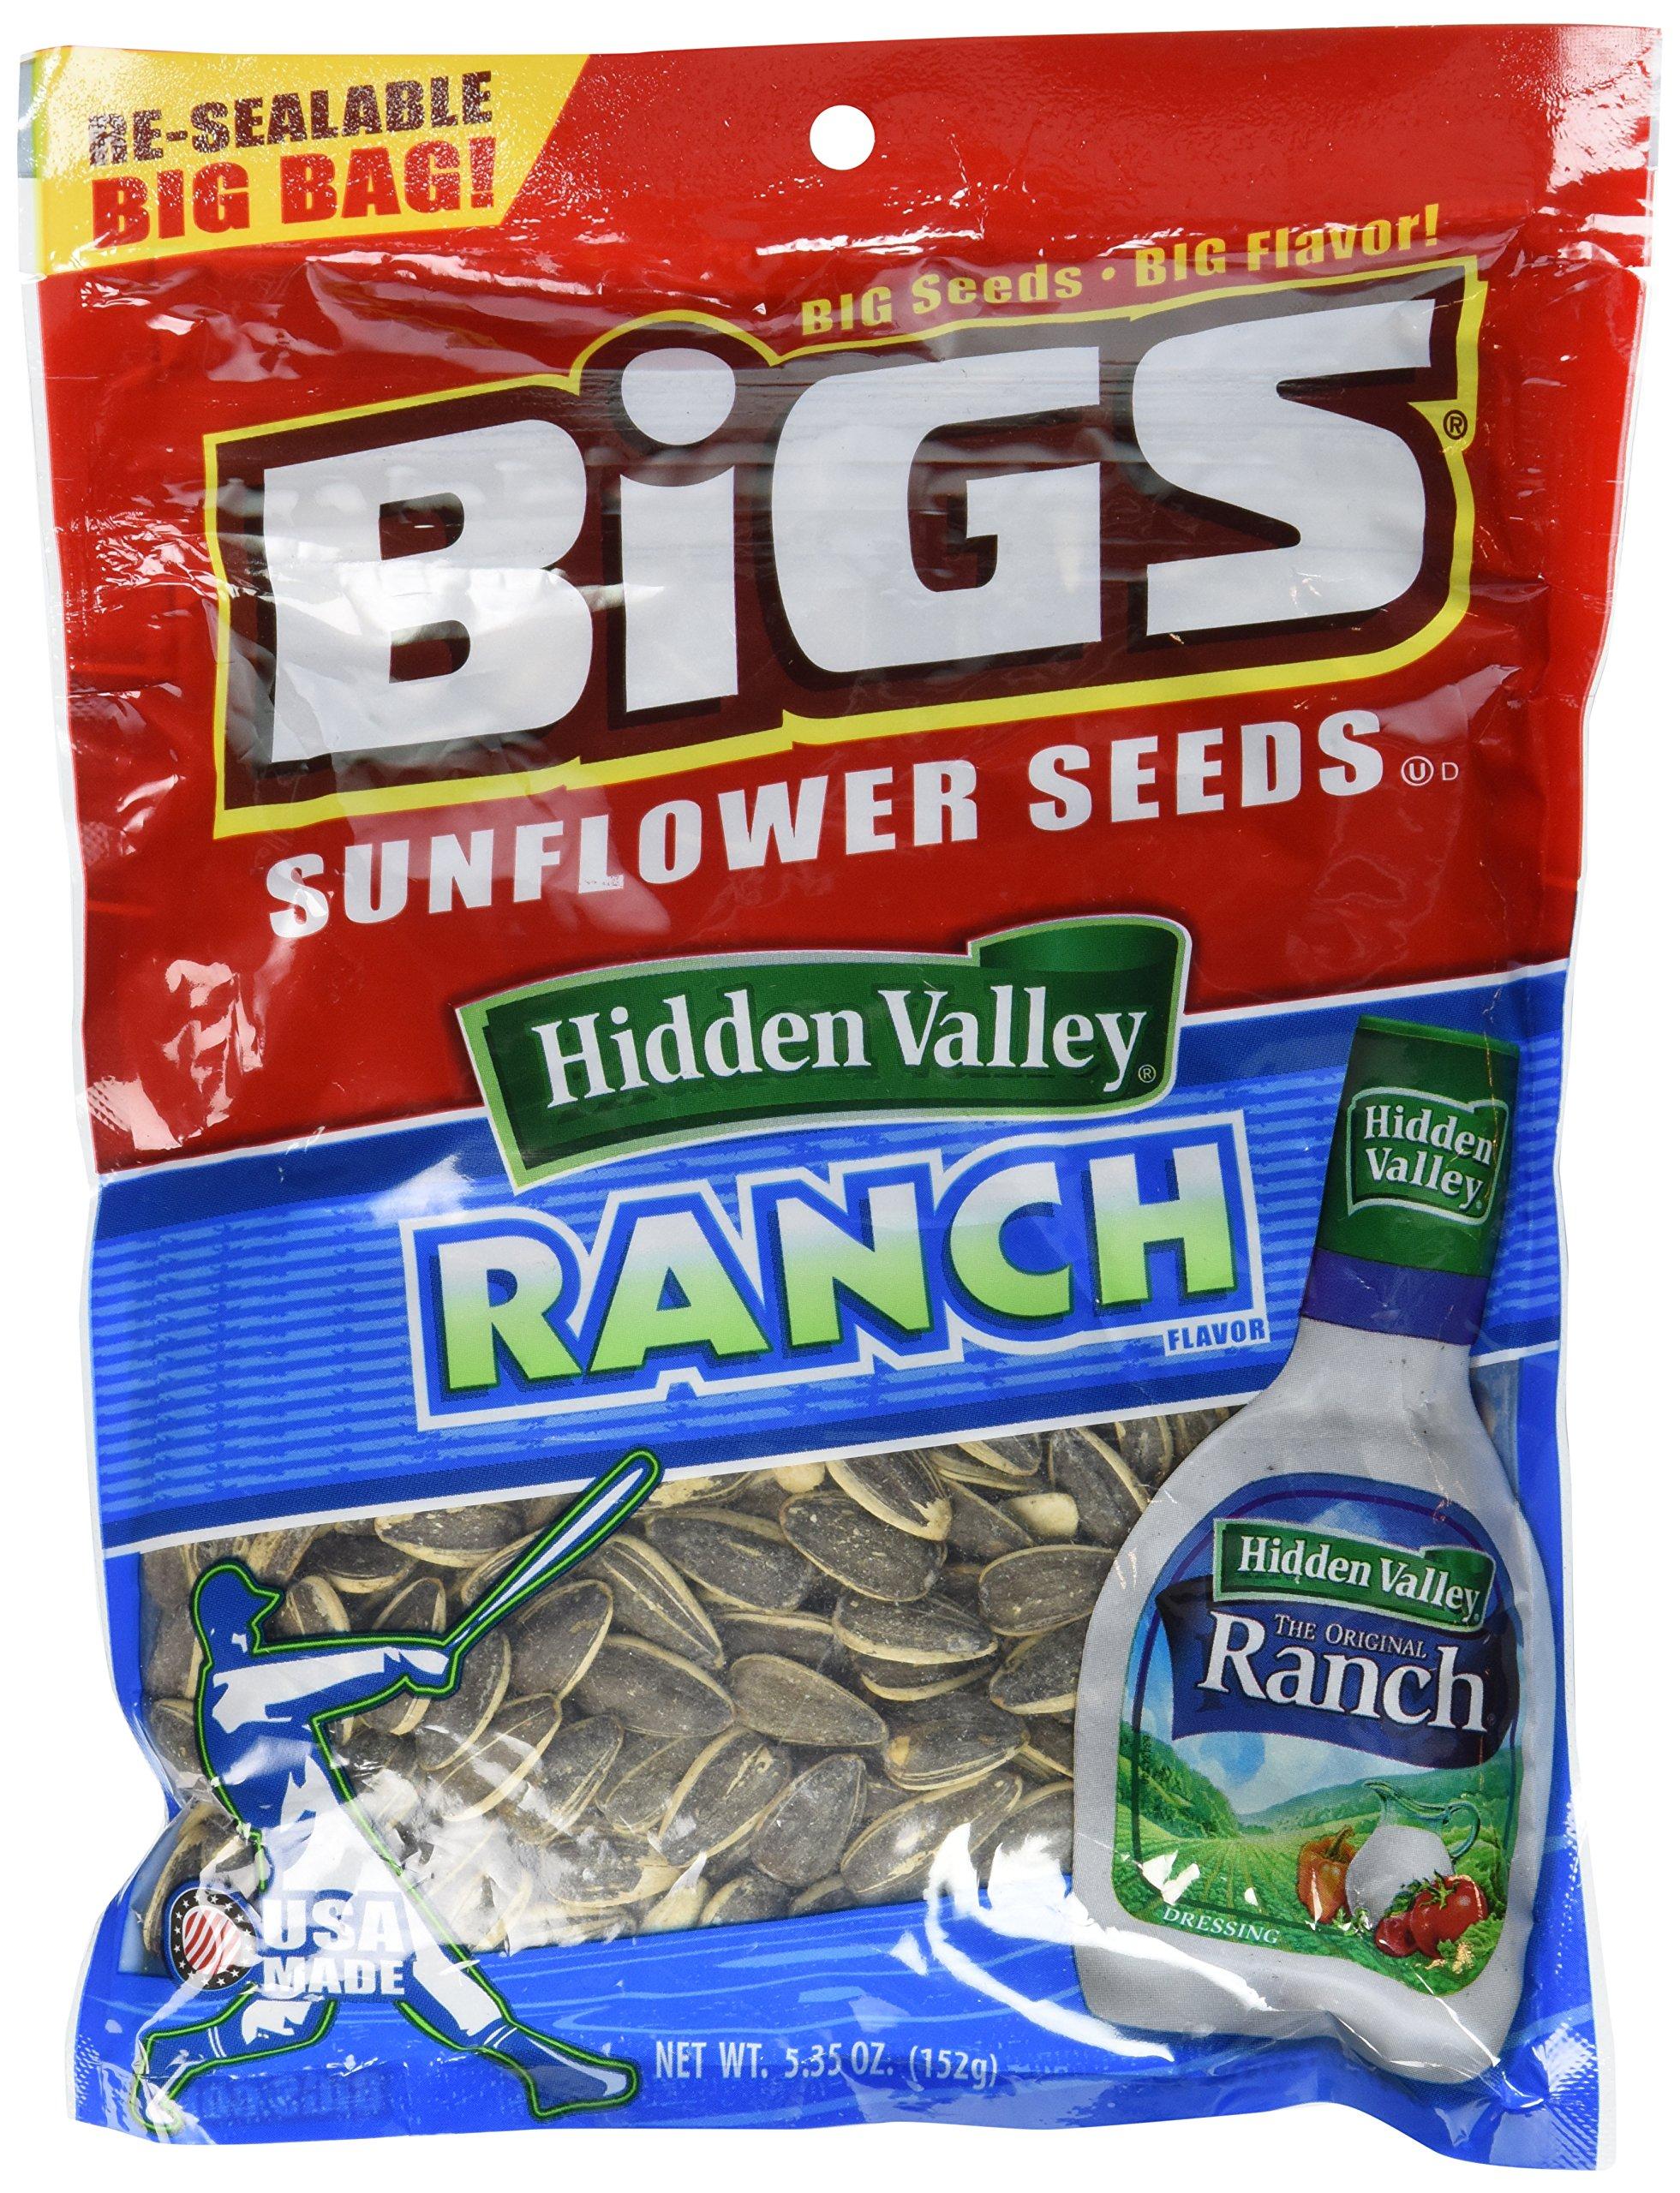 BIGS Seed Sunflower Hidden Valley Ranch, 5.35 oz